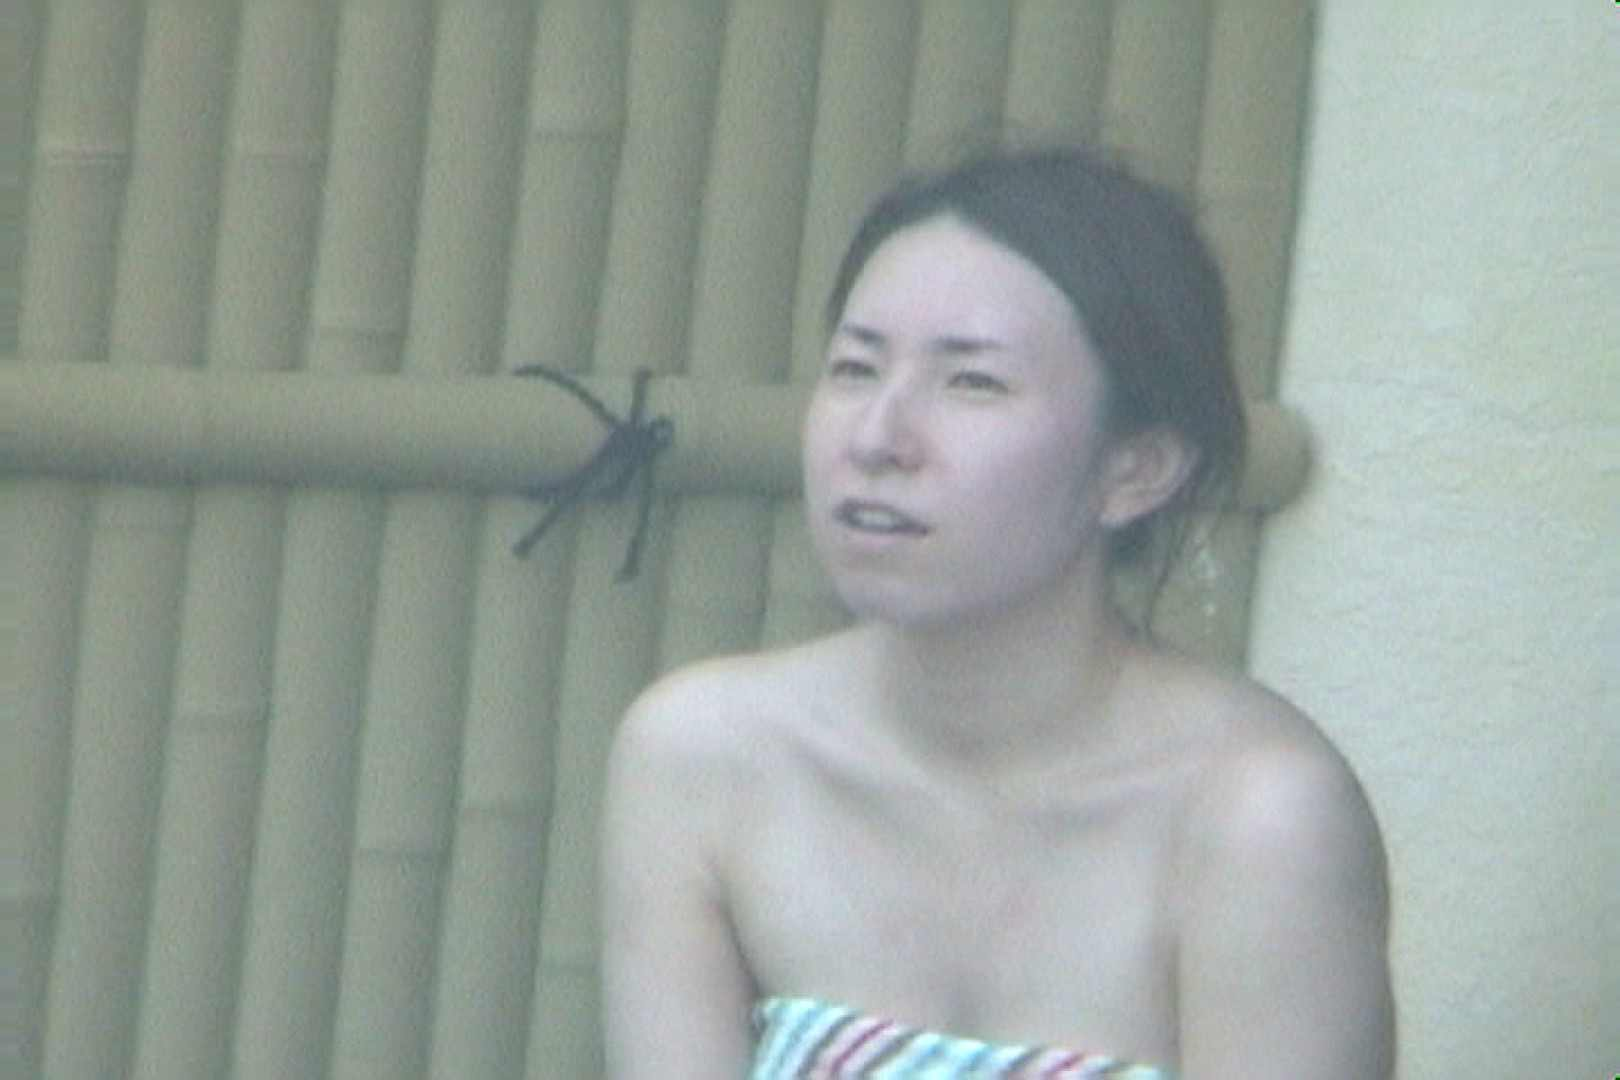 Aquaな露天風呂Vol.106 いやらしいOL アダルト動画キャプチャ 70連発 58